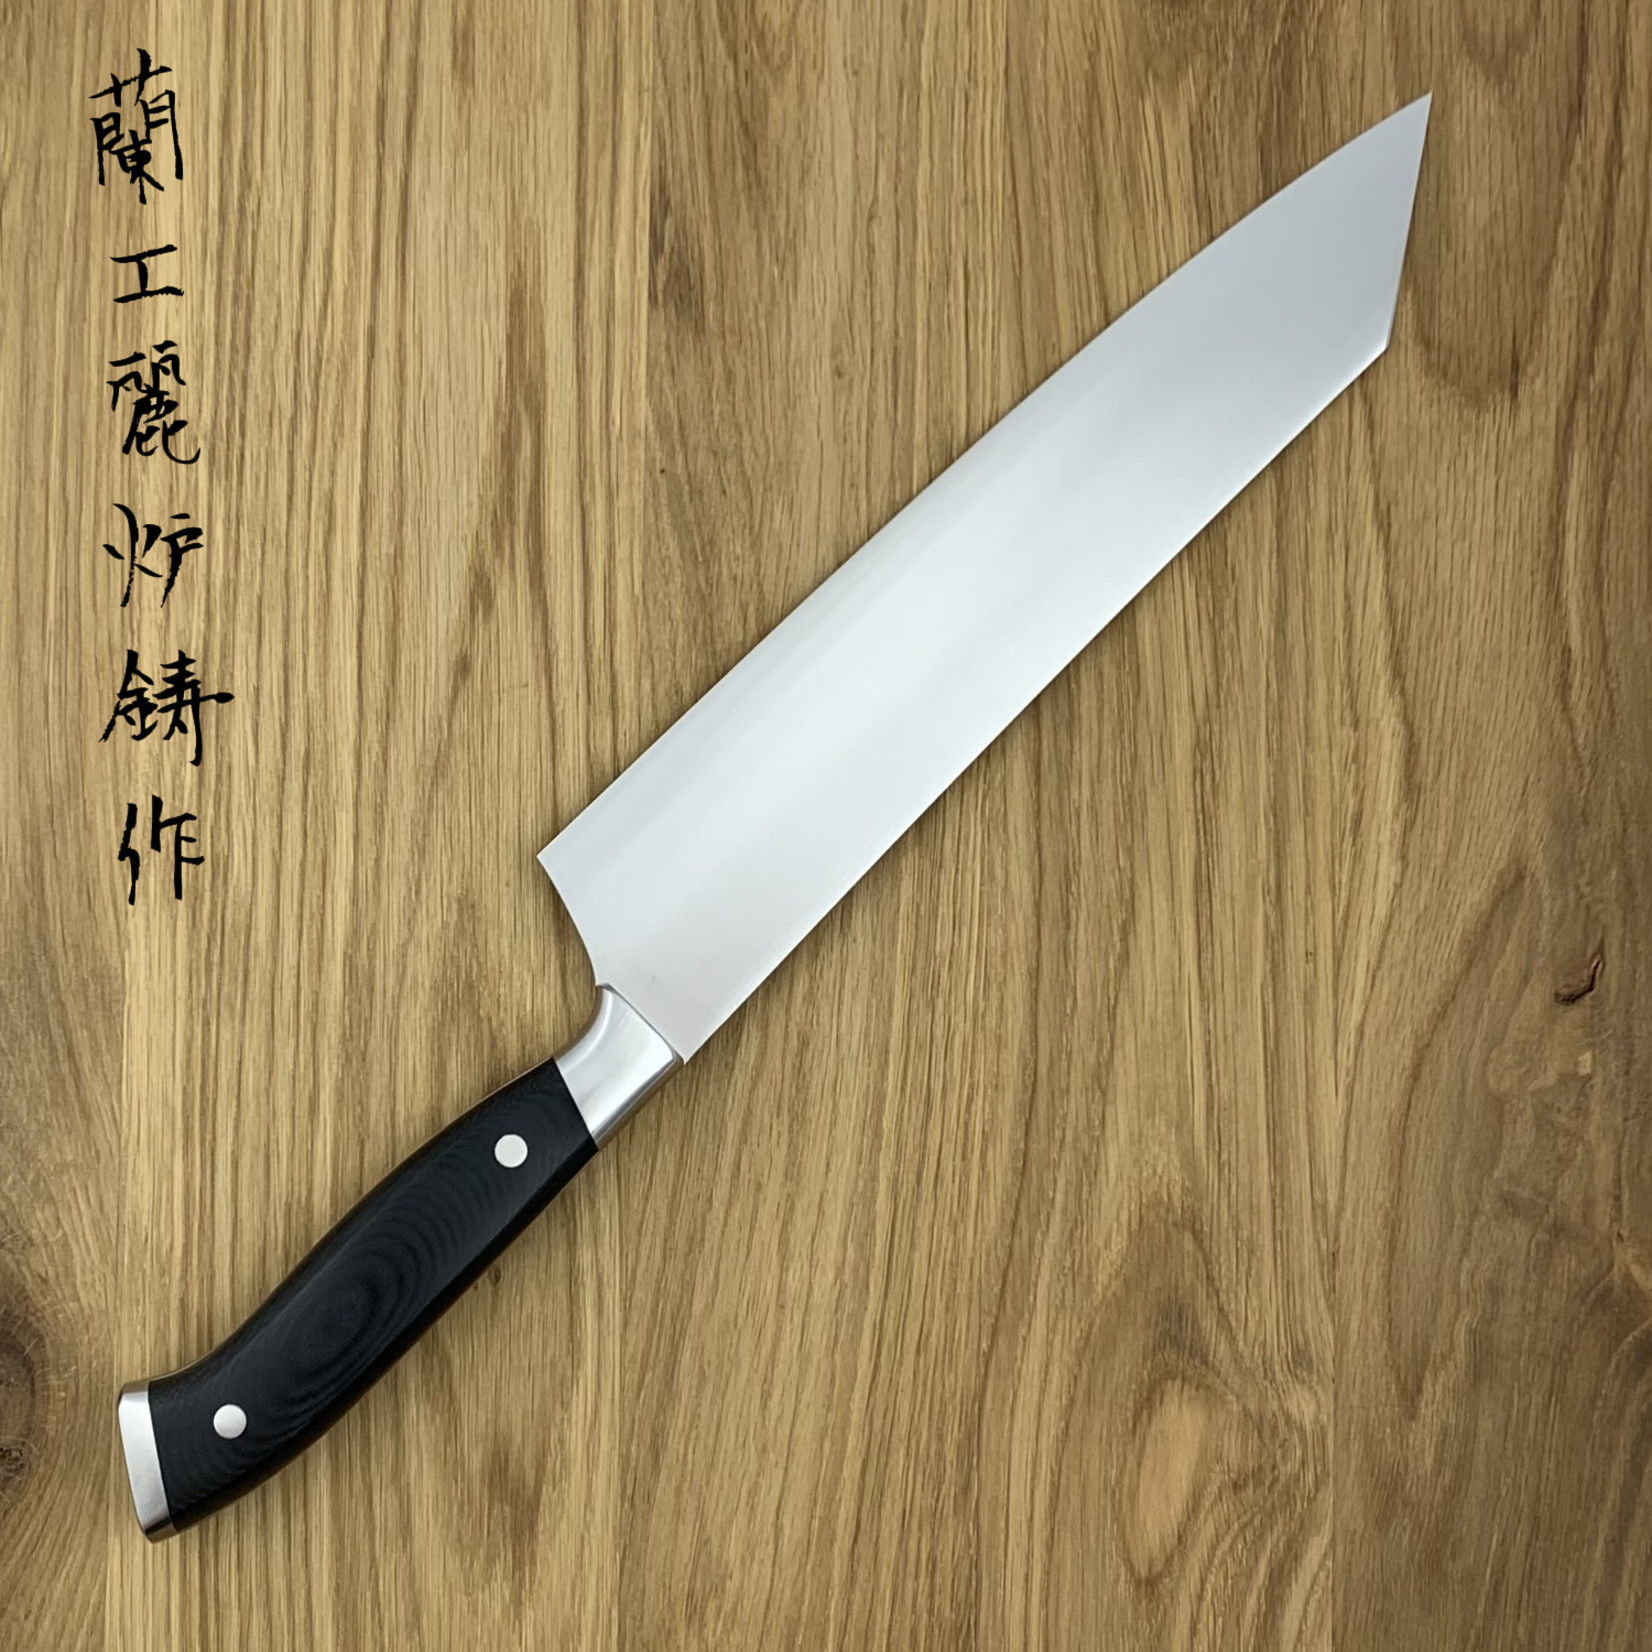 NENOHI NENOX S Black Kiritsuke 240 mm